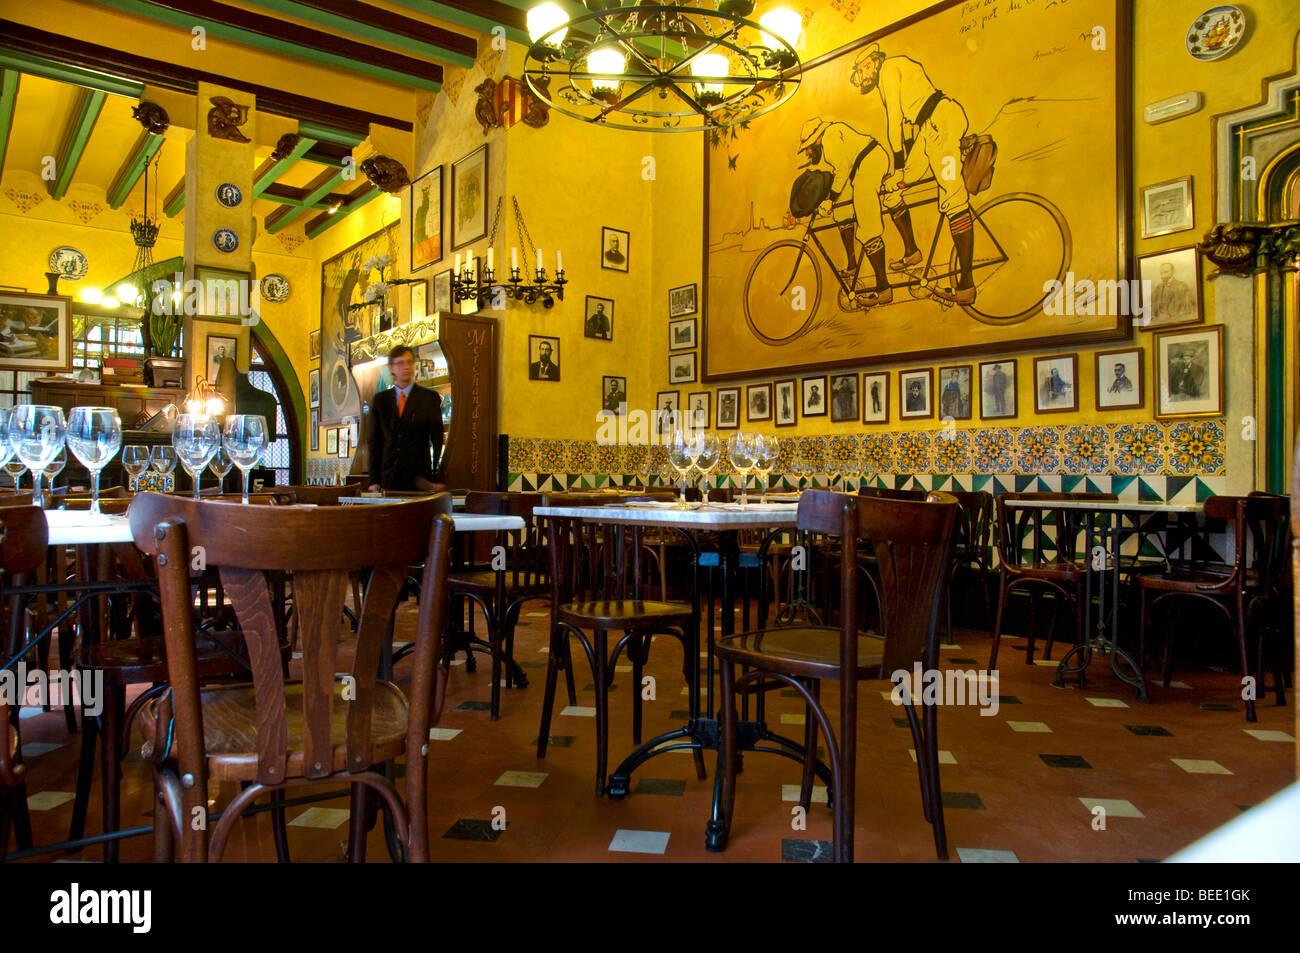 Restaurant Gats Barcelona : Eating history el gats in barcelona spain